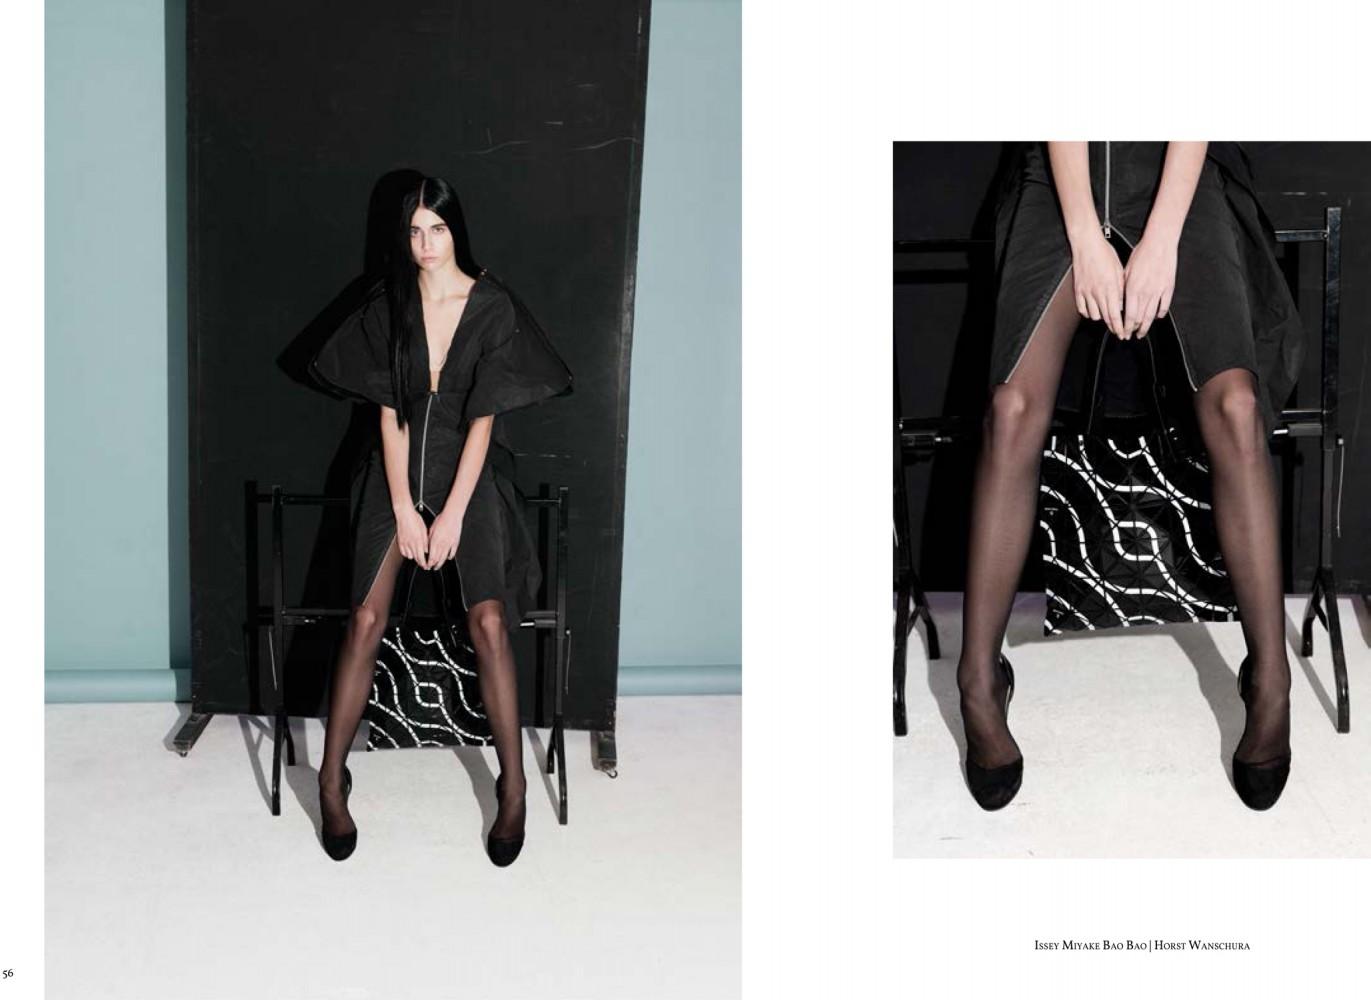 Monica-Menez-Fotostrecke-Magazin-5